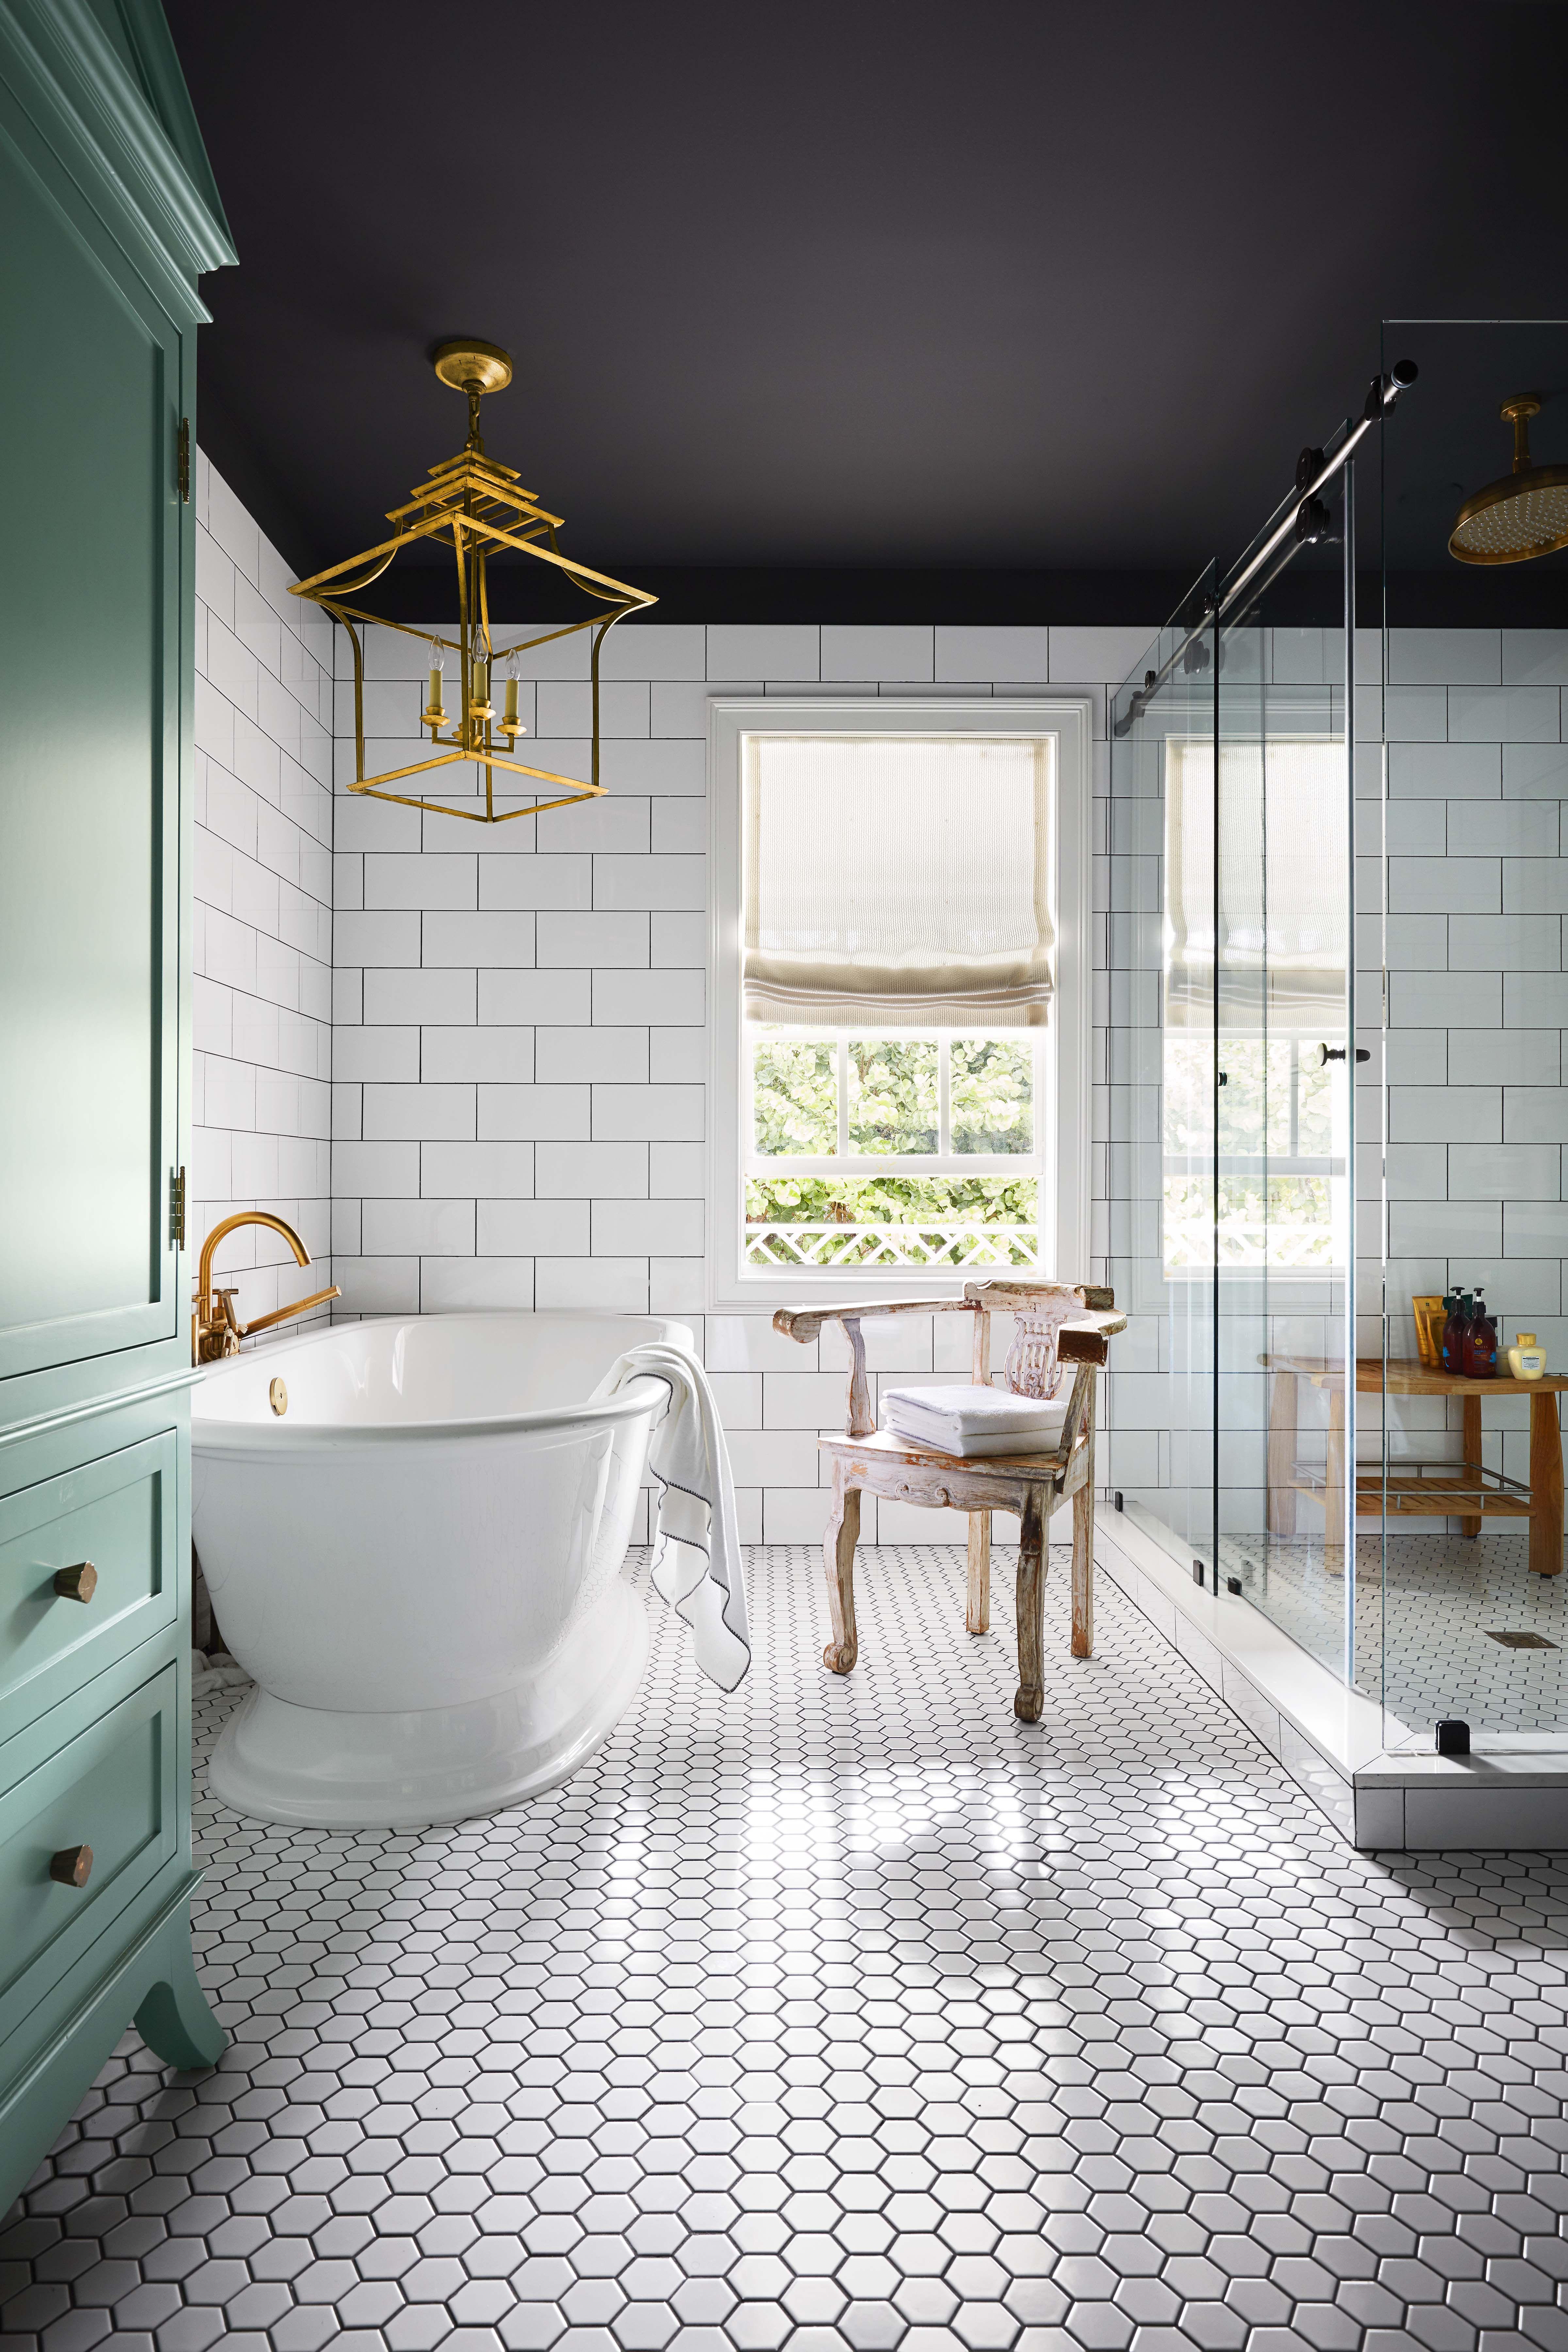 Bathroom Renovation Guide How To, Redoing My Bathroom